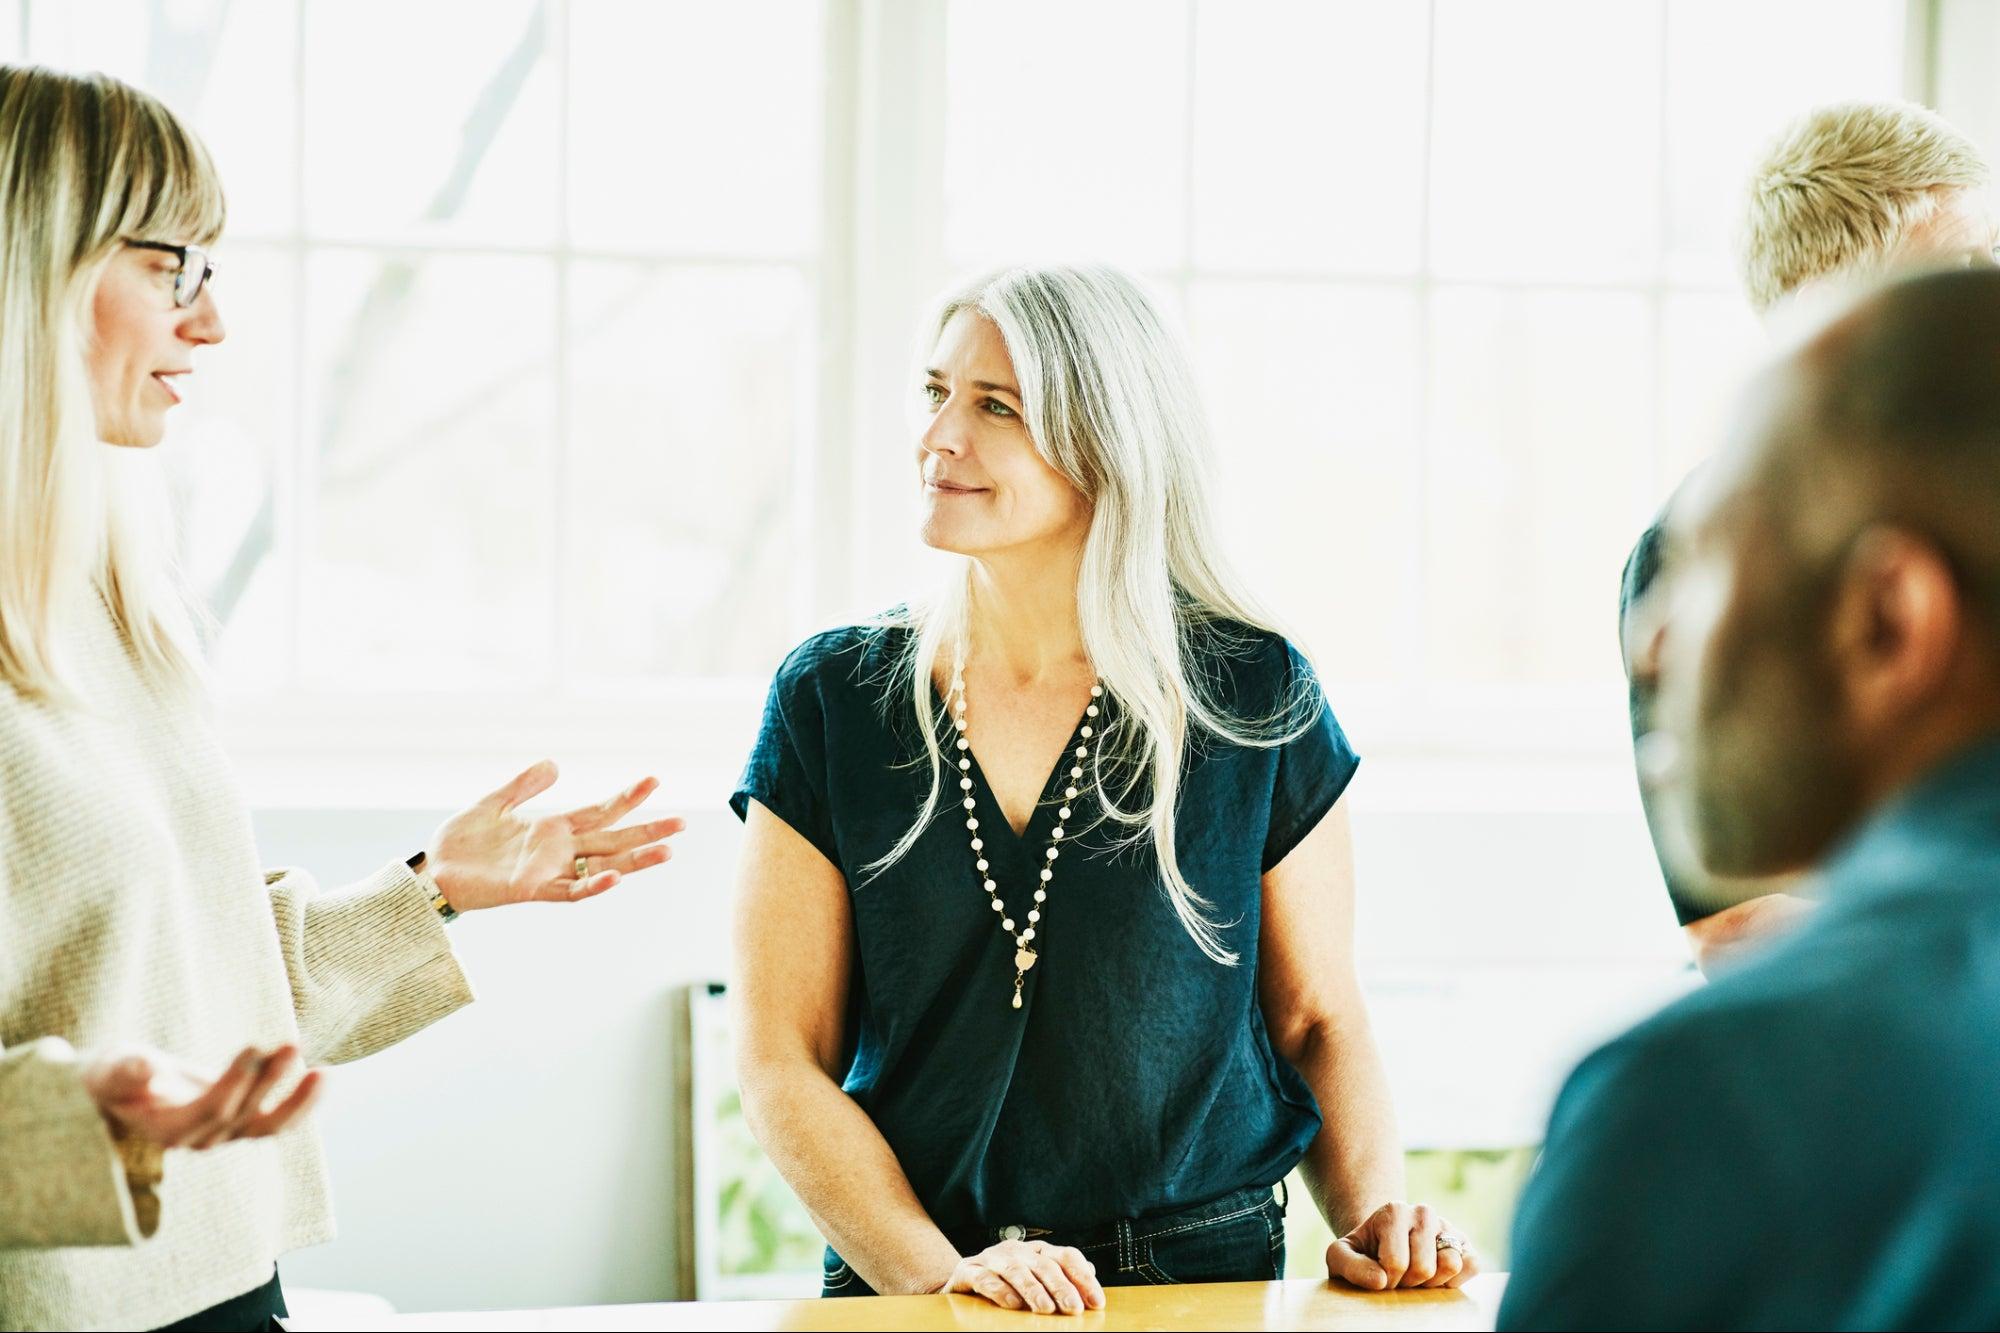 entrepreneur.com - Angela Kambouris - 9 Strategies To Build An Employee-First Culture